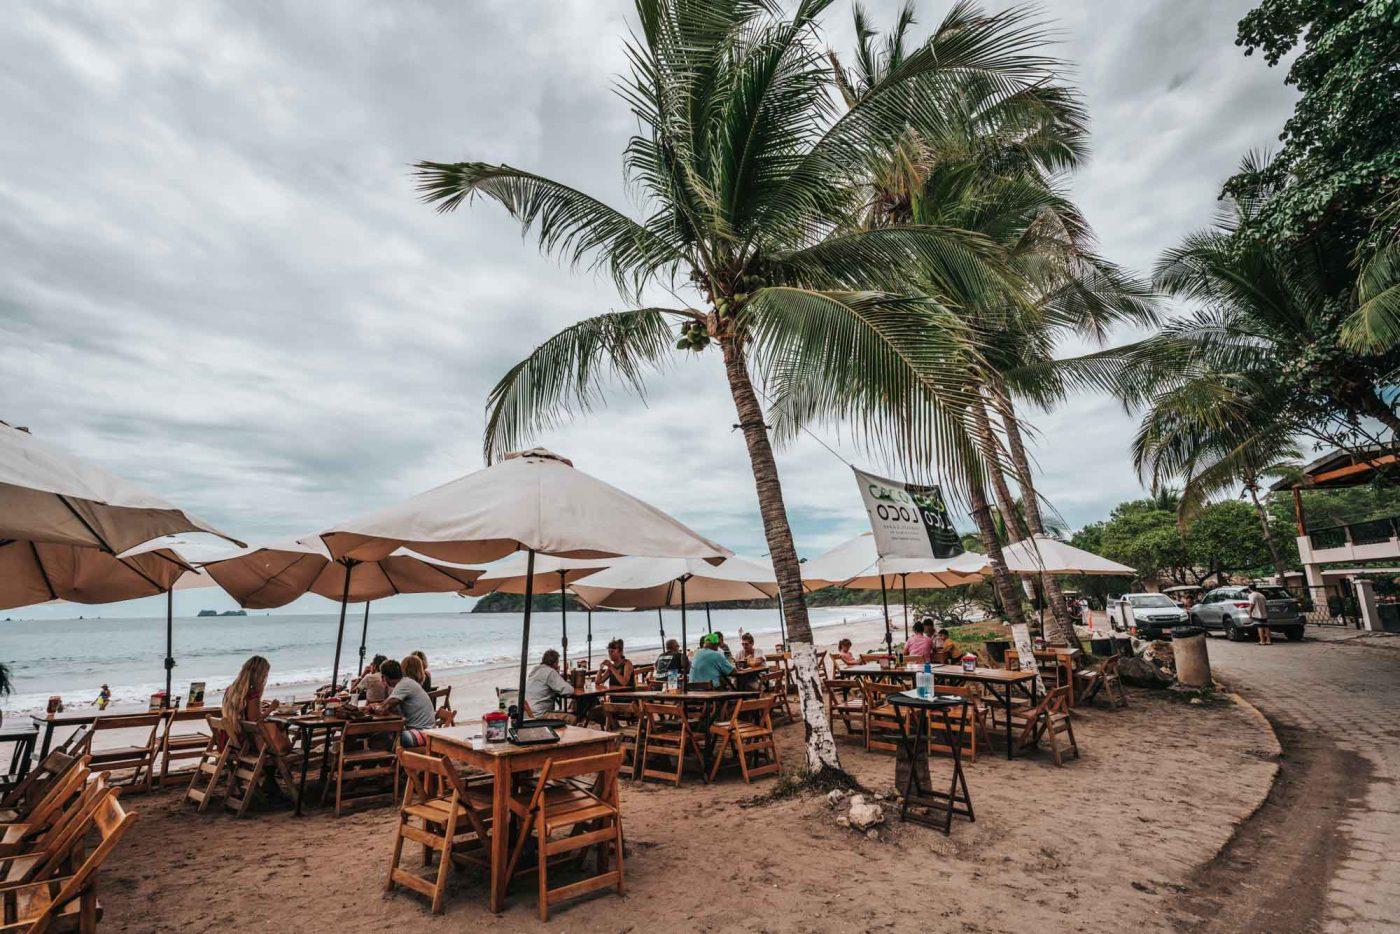 Coco Loco restaurant in Playa Flamingo, Costa Rica